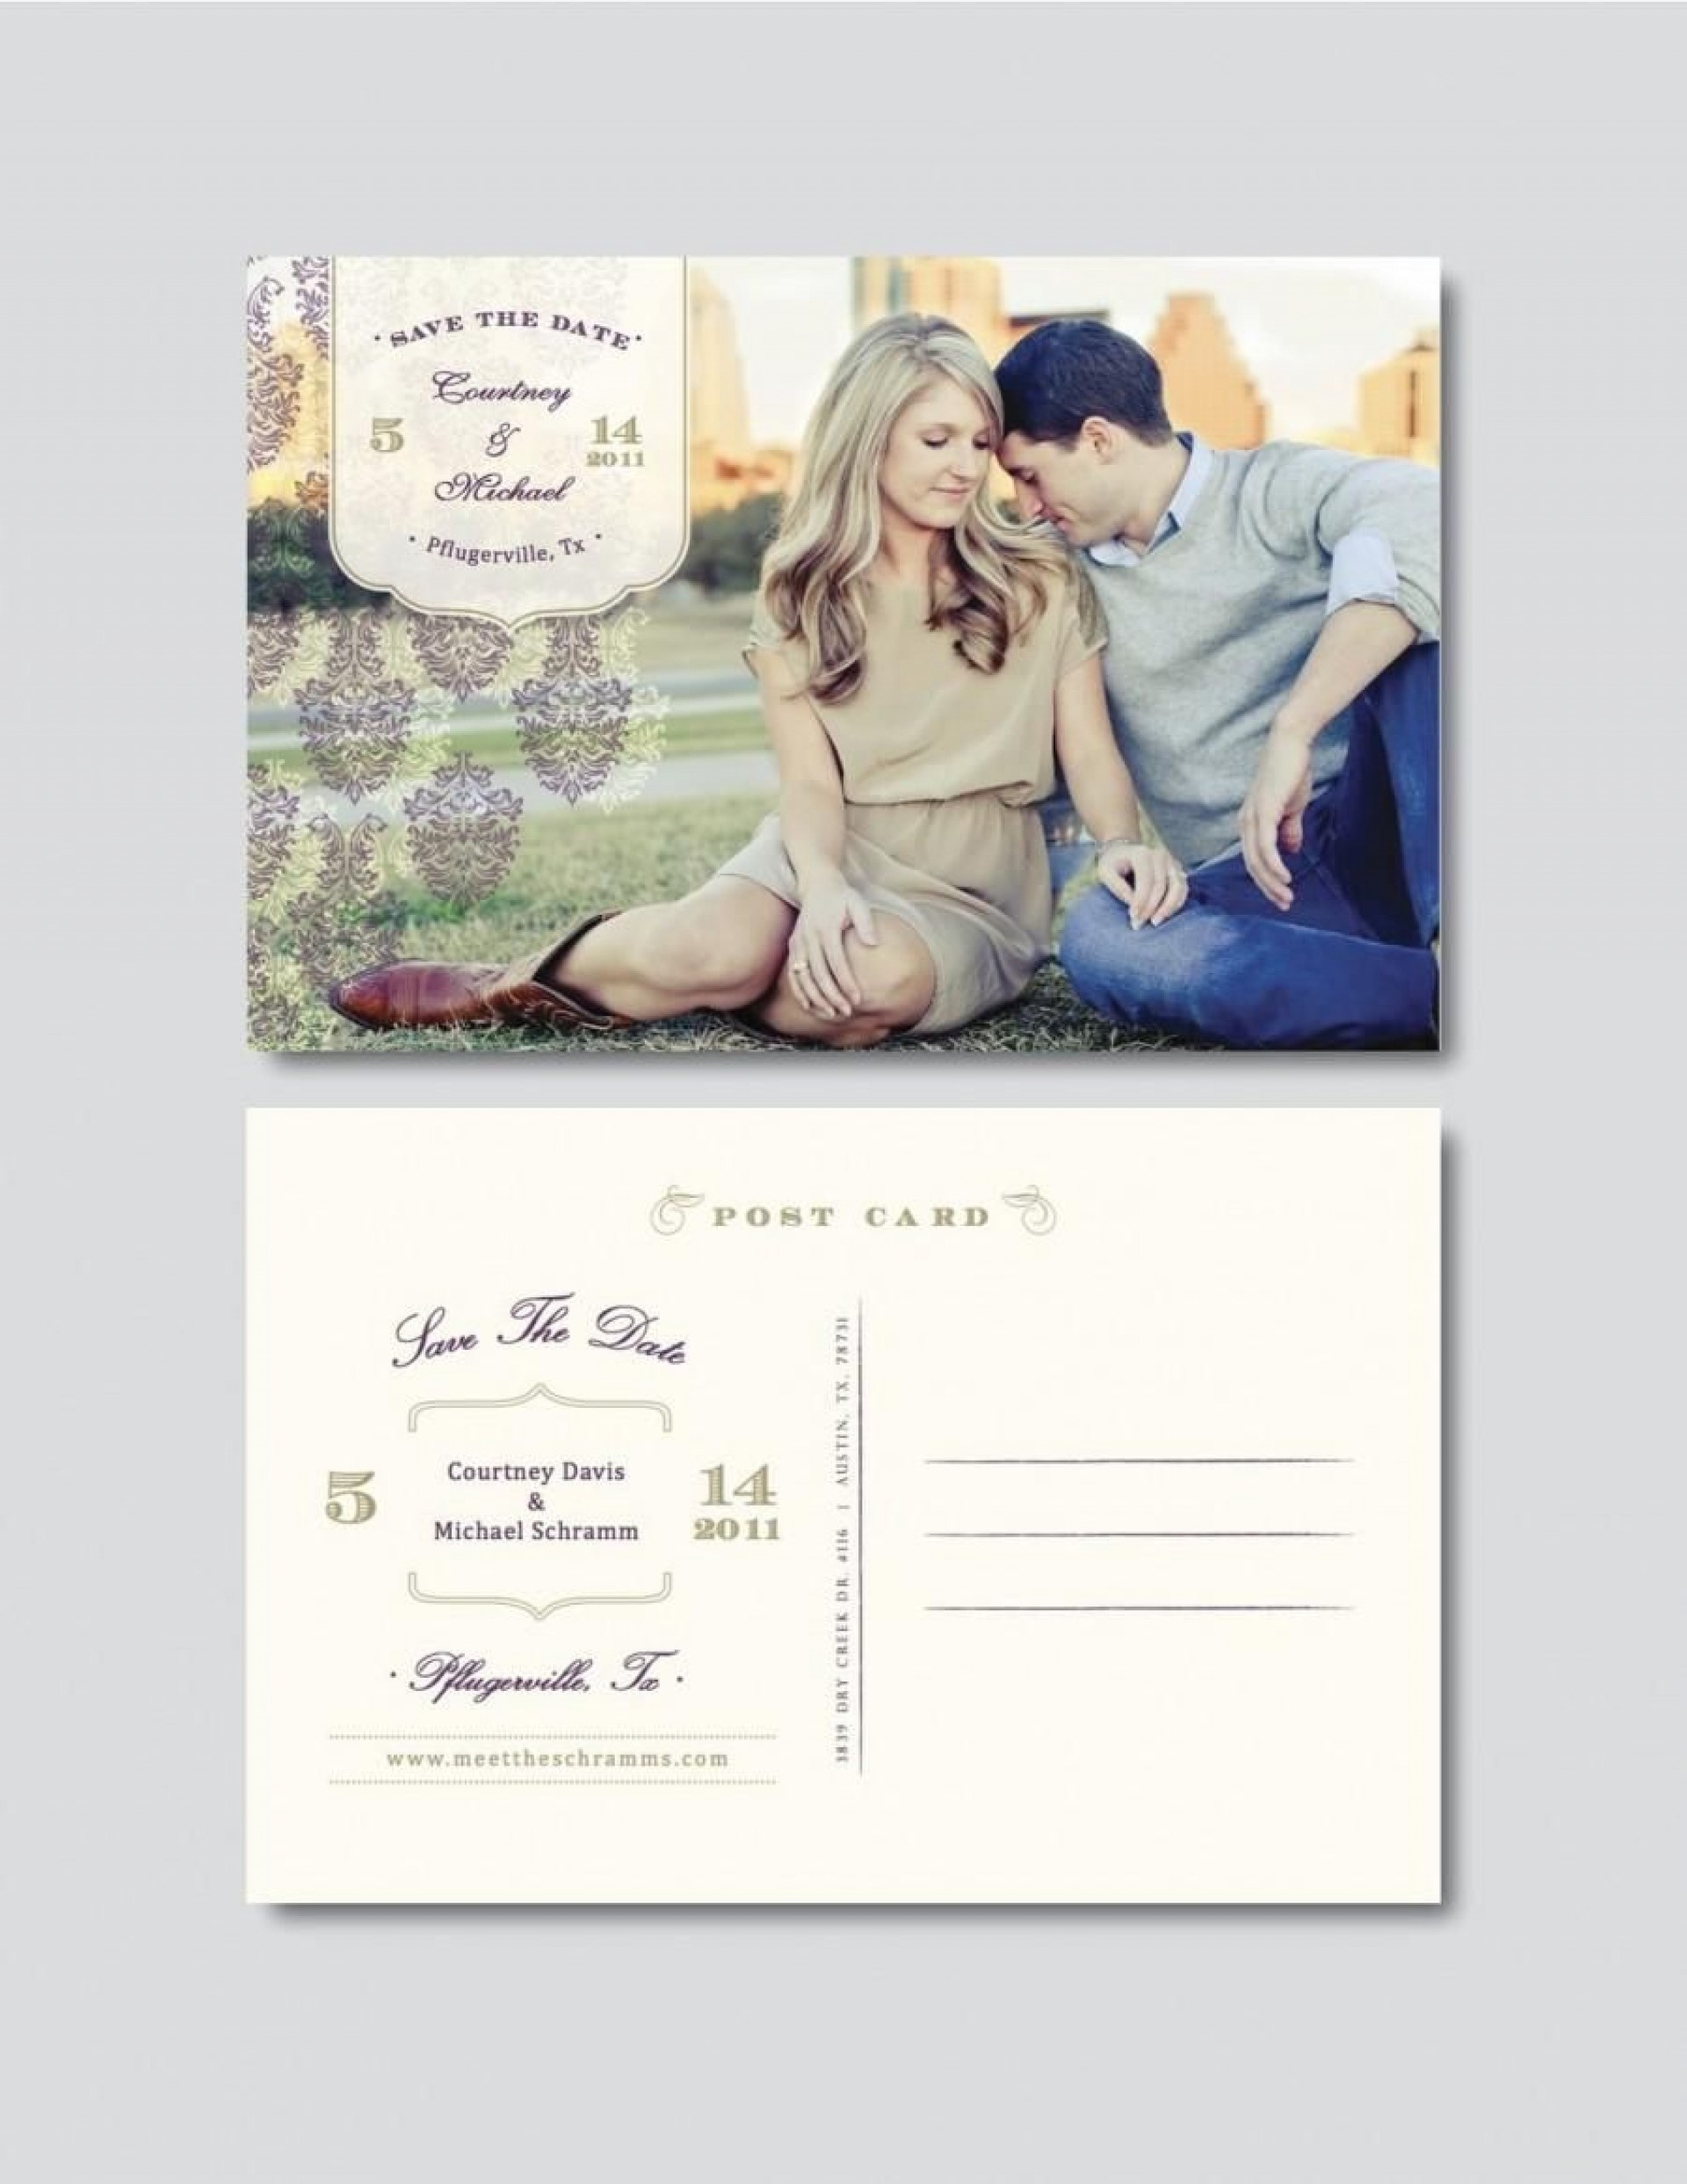 009 Surprising Save The Date Postcard Template Photo  Diy Free Birthday1920